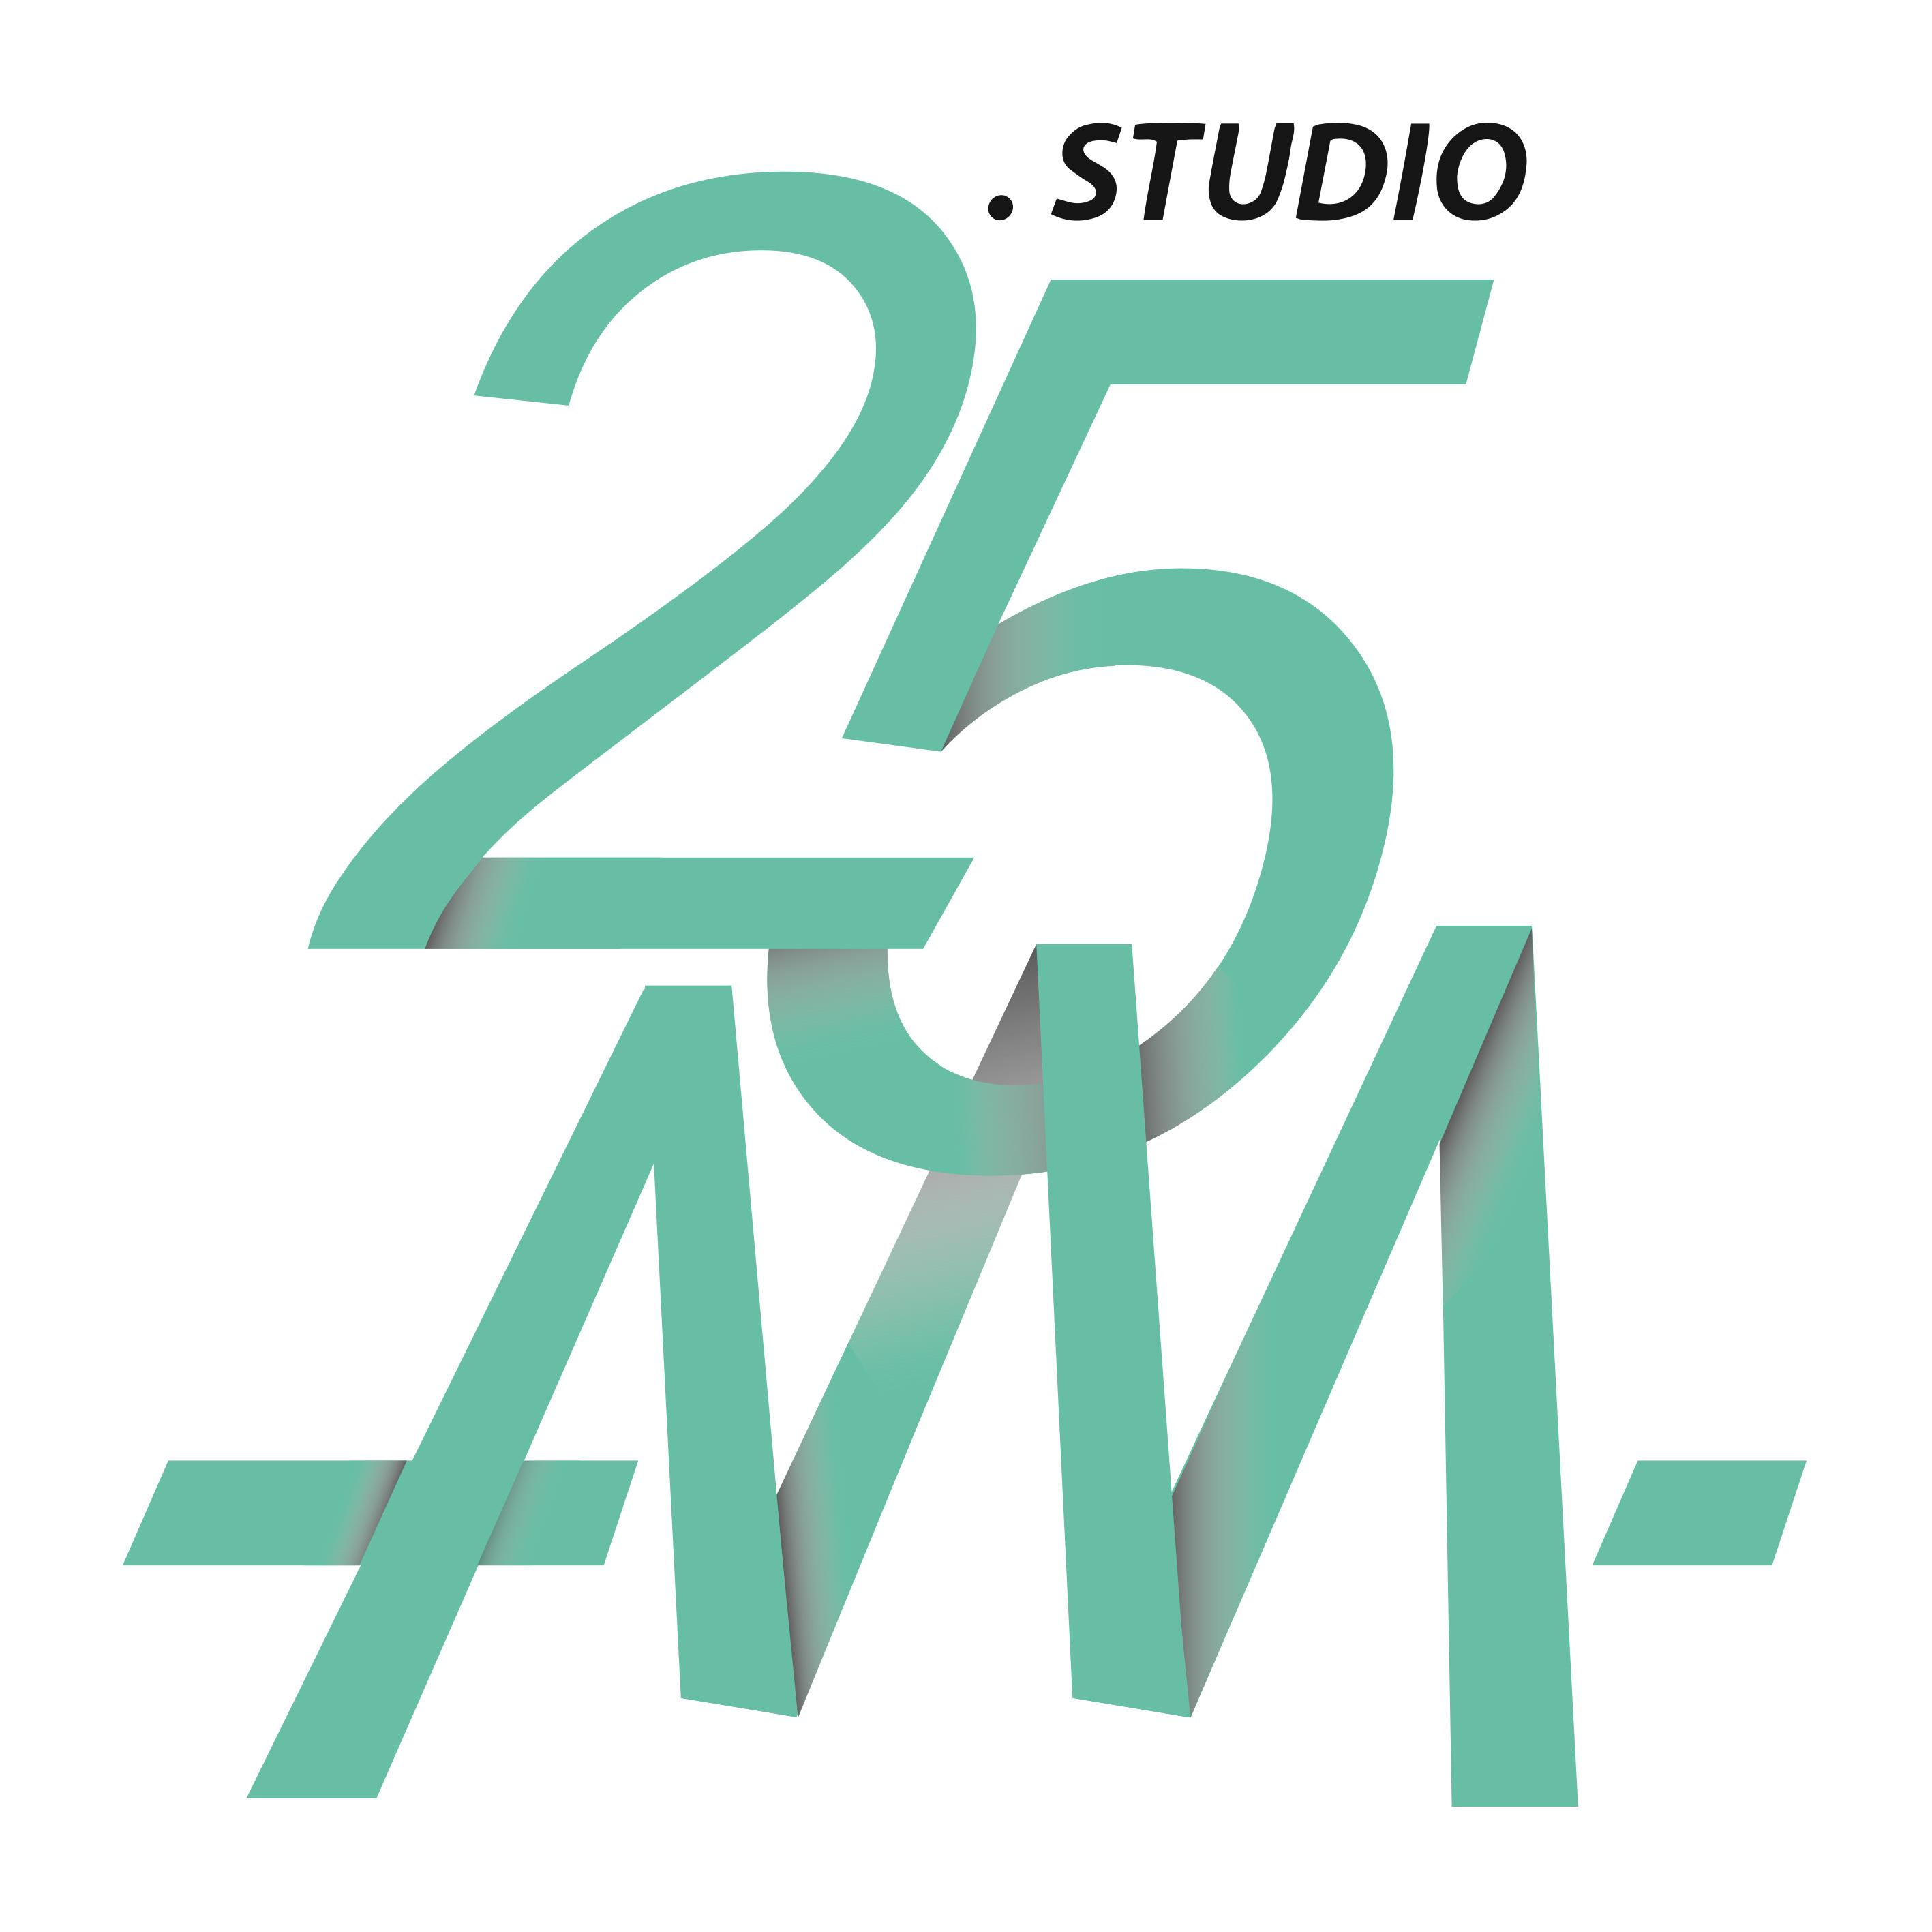 STUDIO 25AM